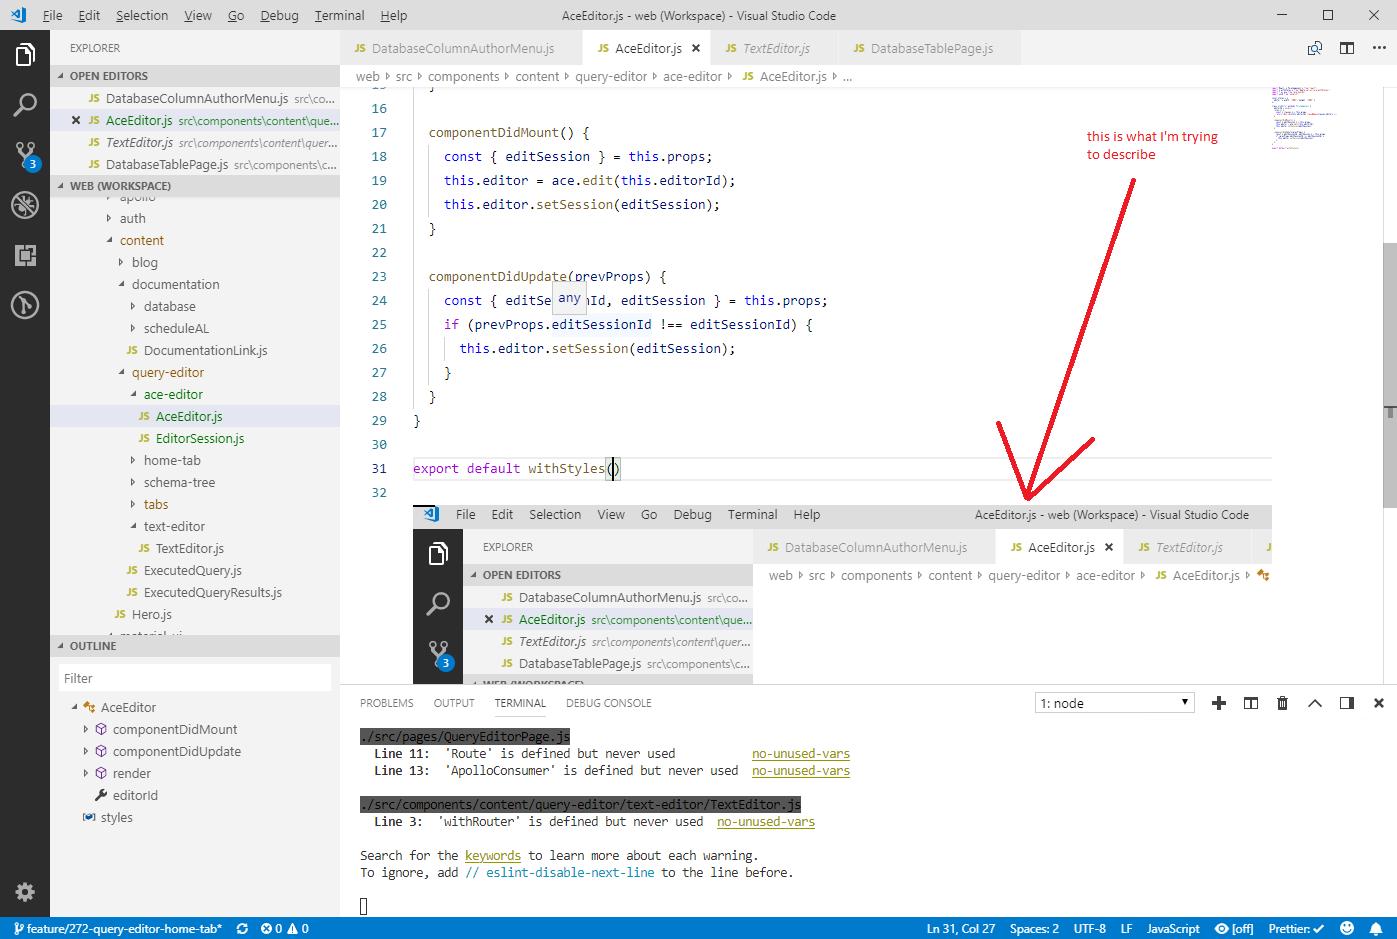 Portions of VS Code window sometimes